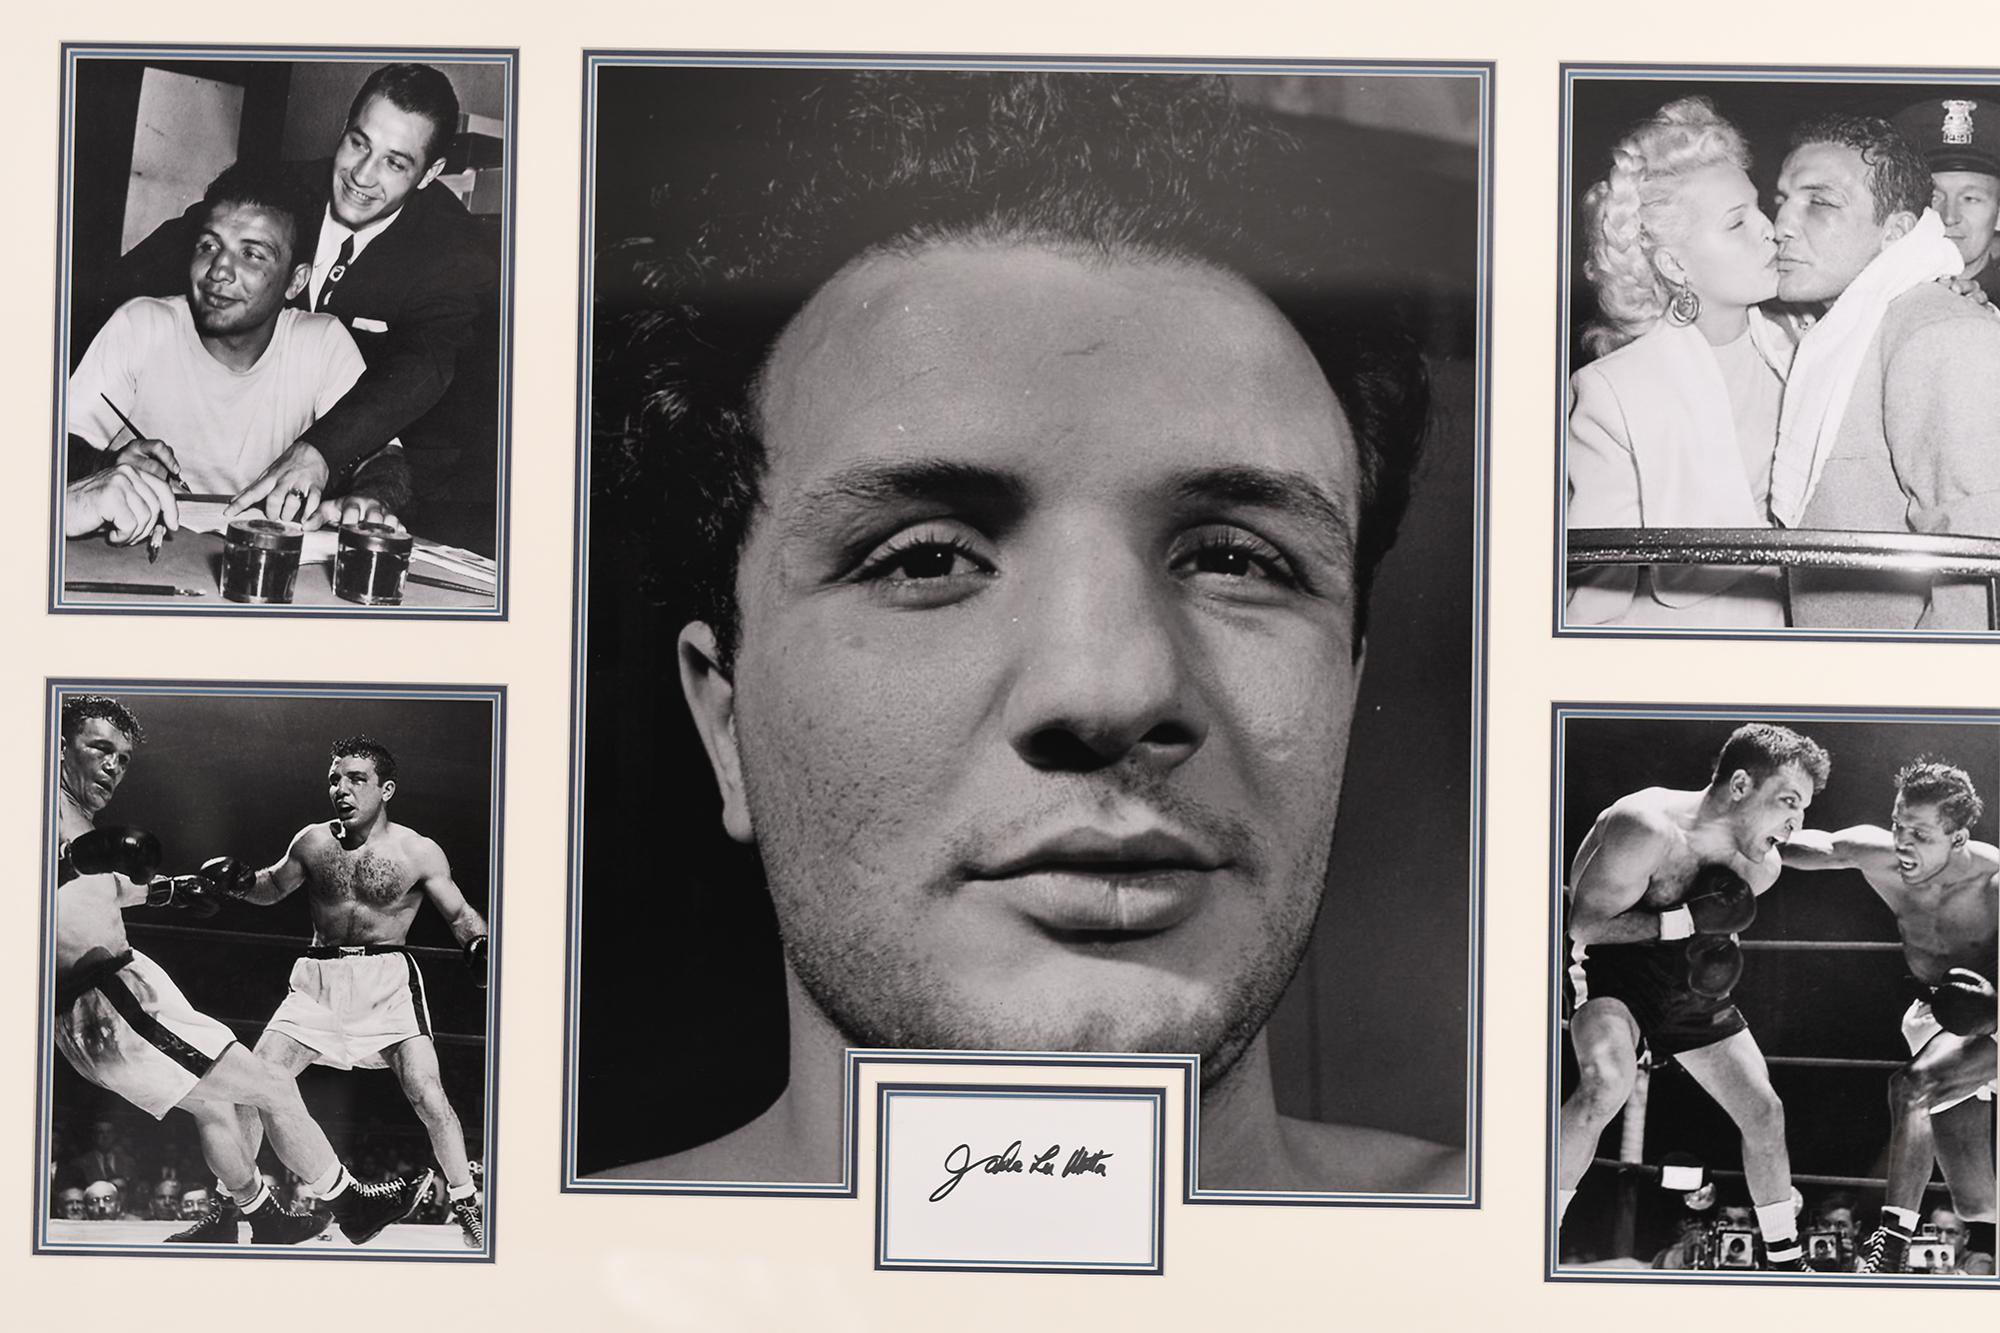 Jake Lamotta Framed Signature Presentation - Image 2 of 4